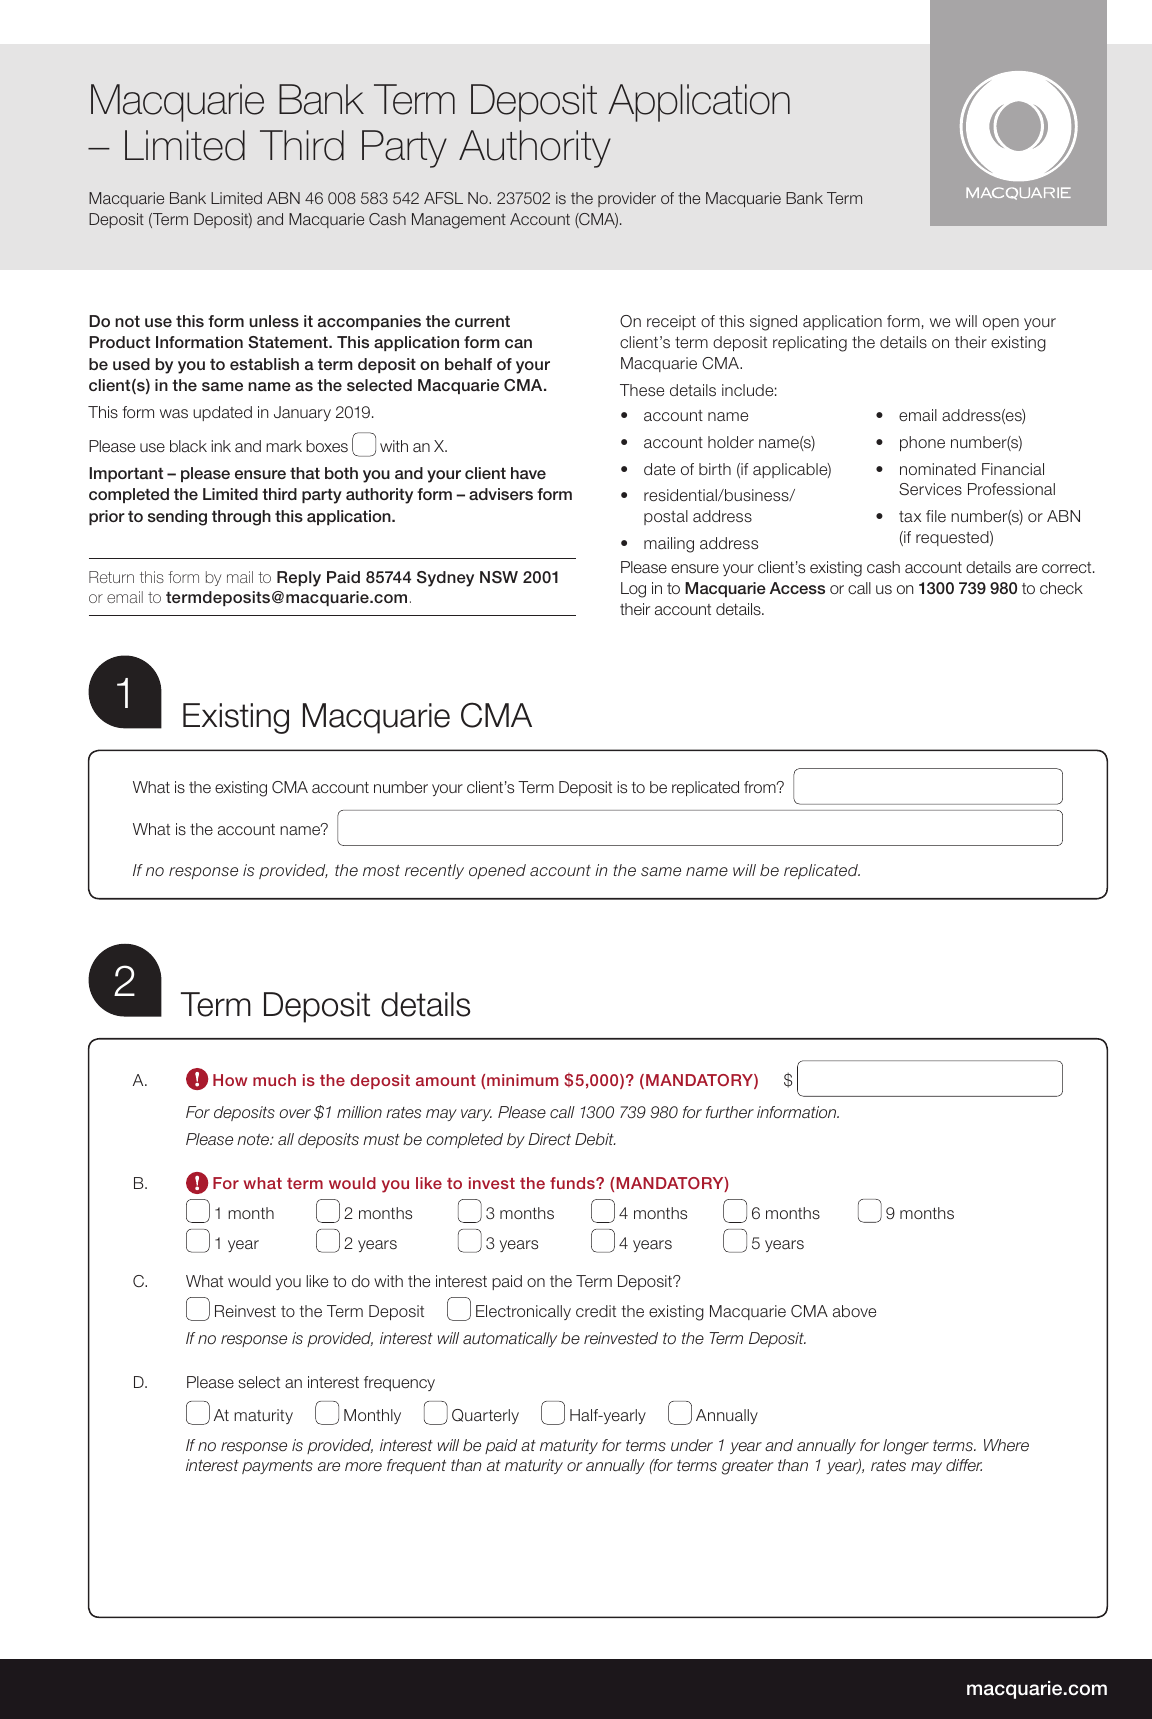 macquarie bank term deposit application form